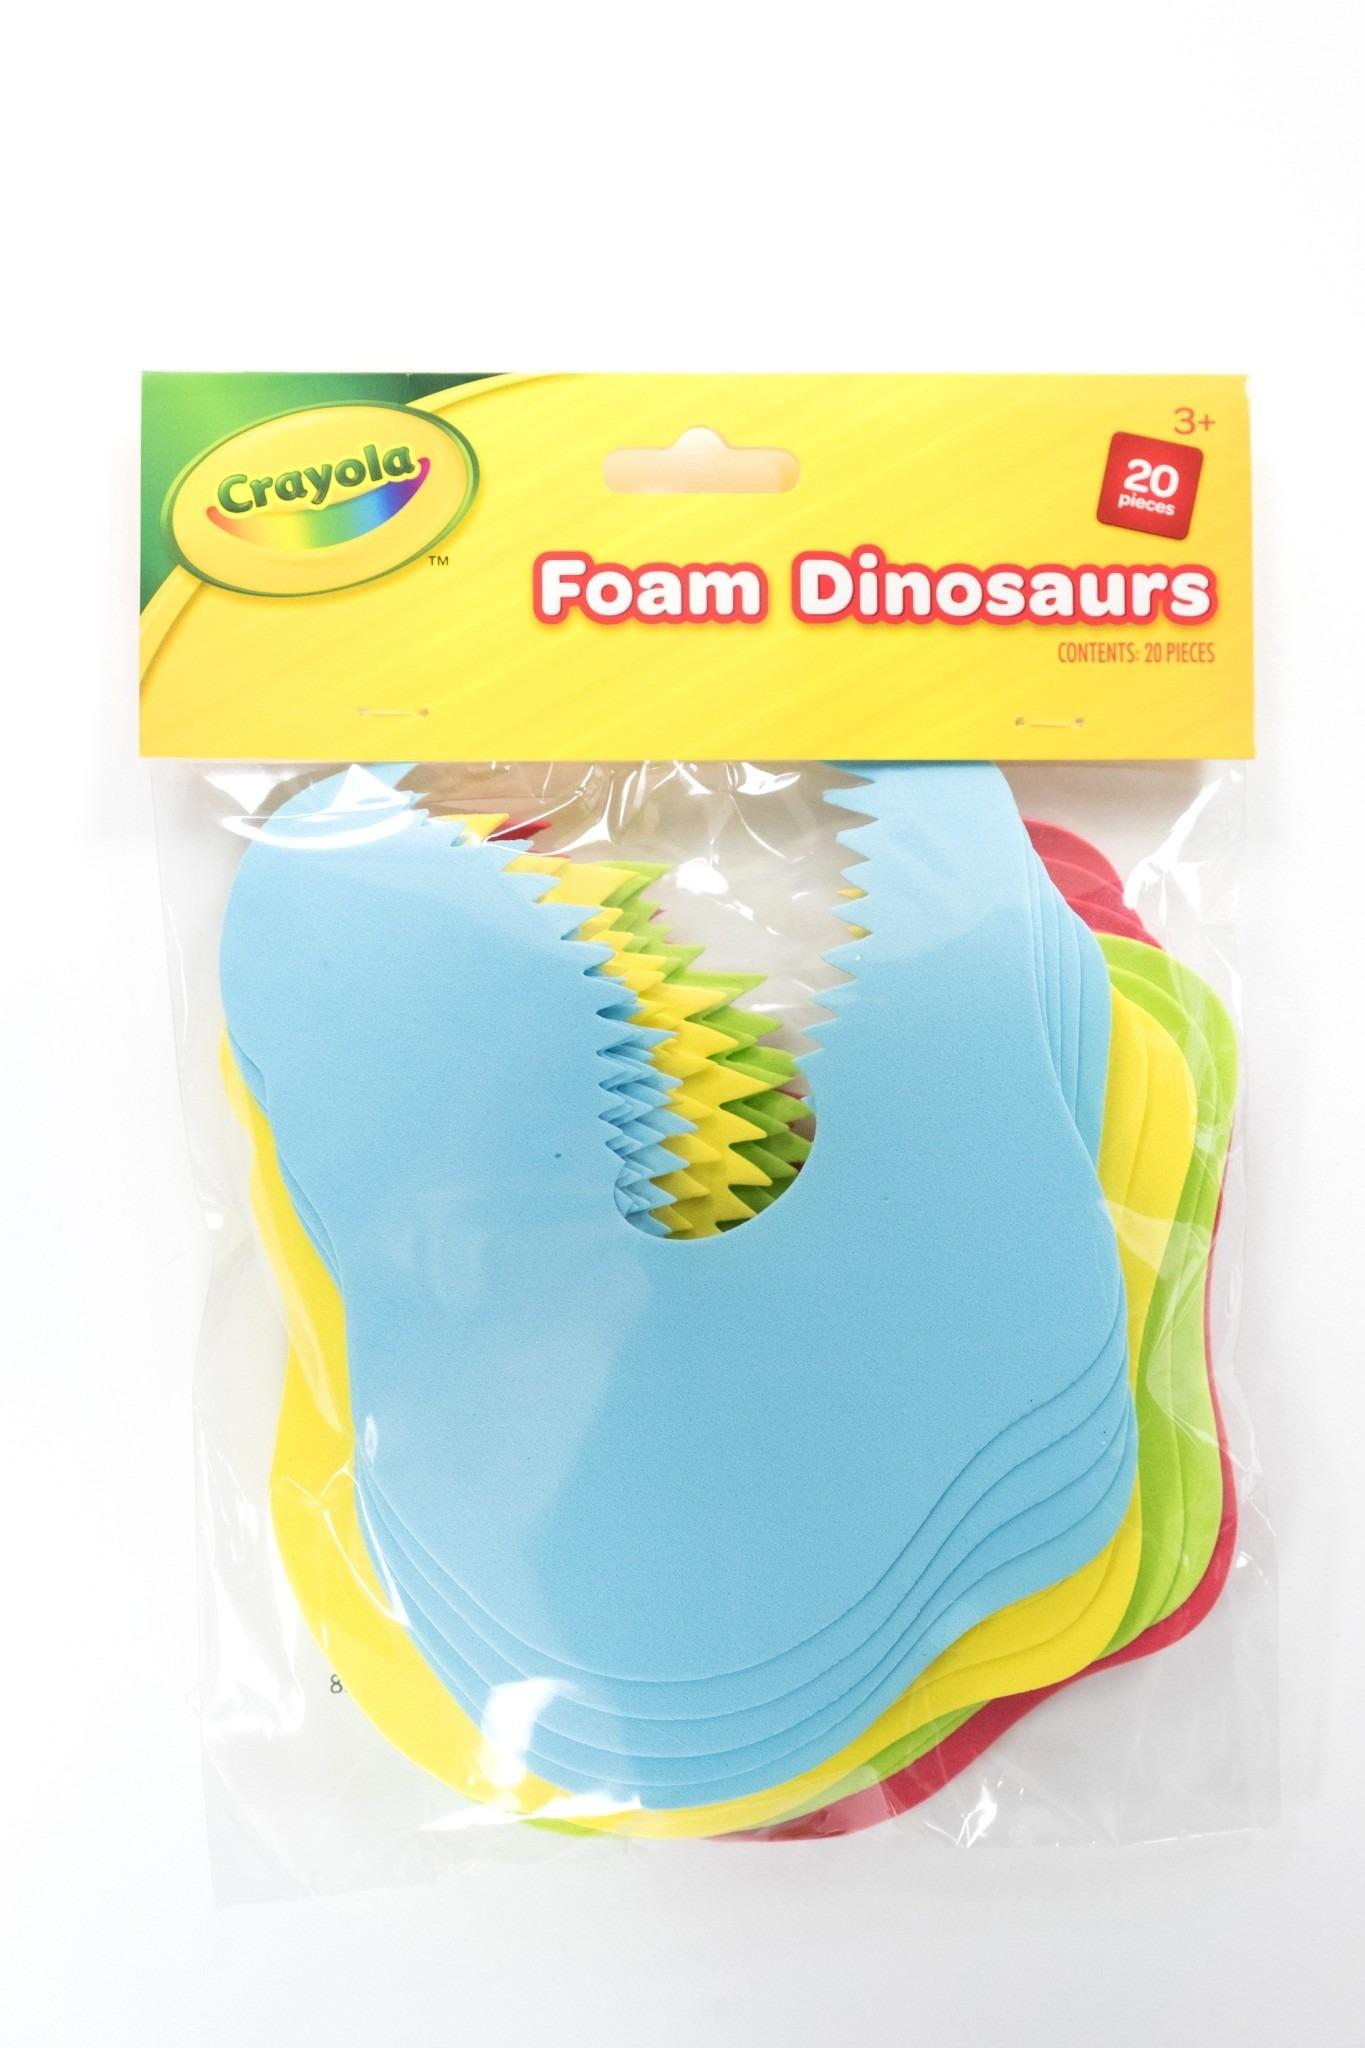 Crayola Craft - Foam Dinosaurs - 20 pcs